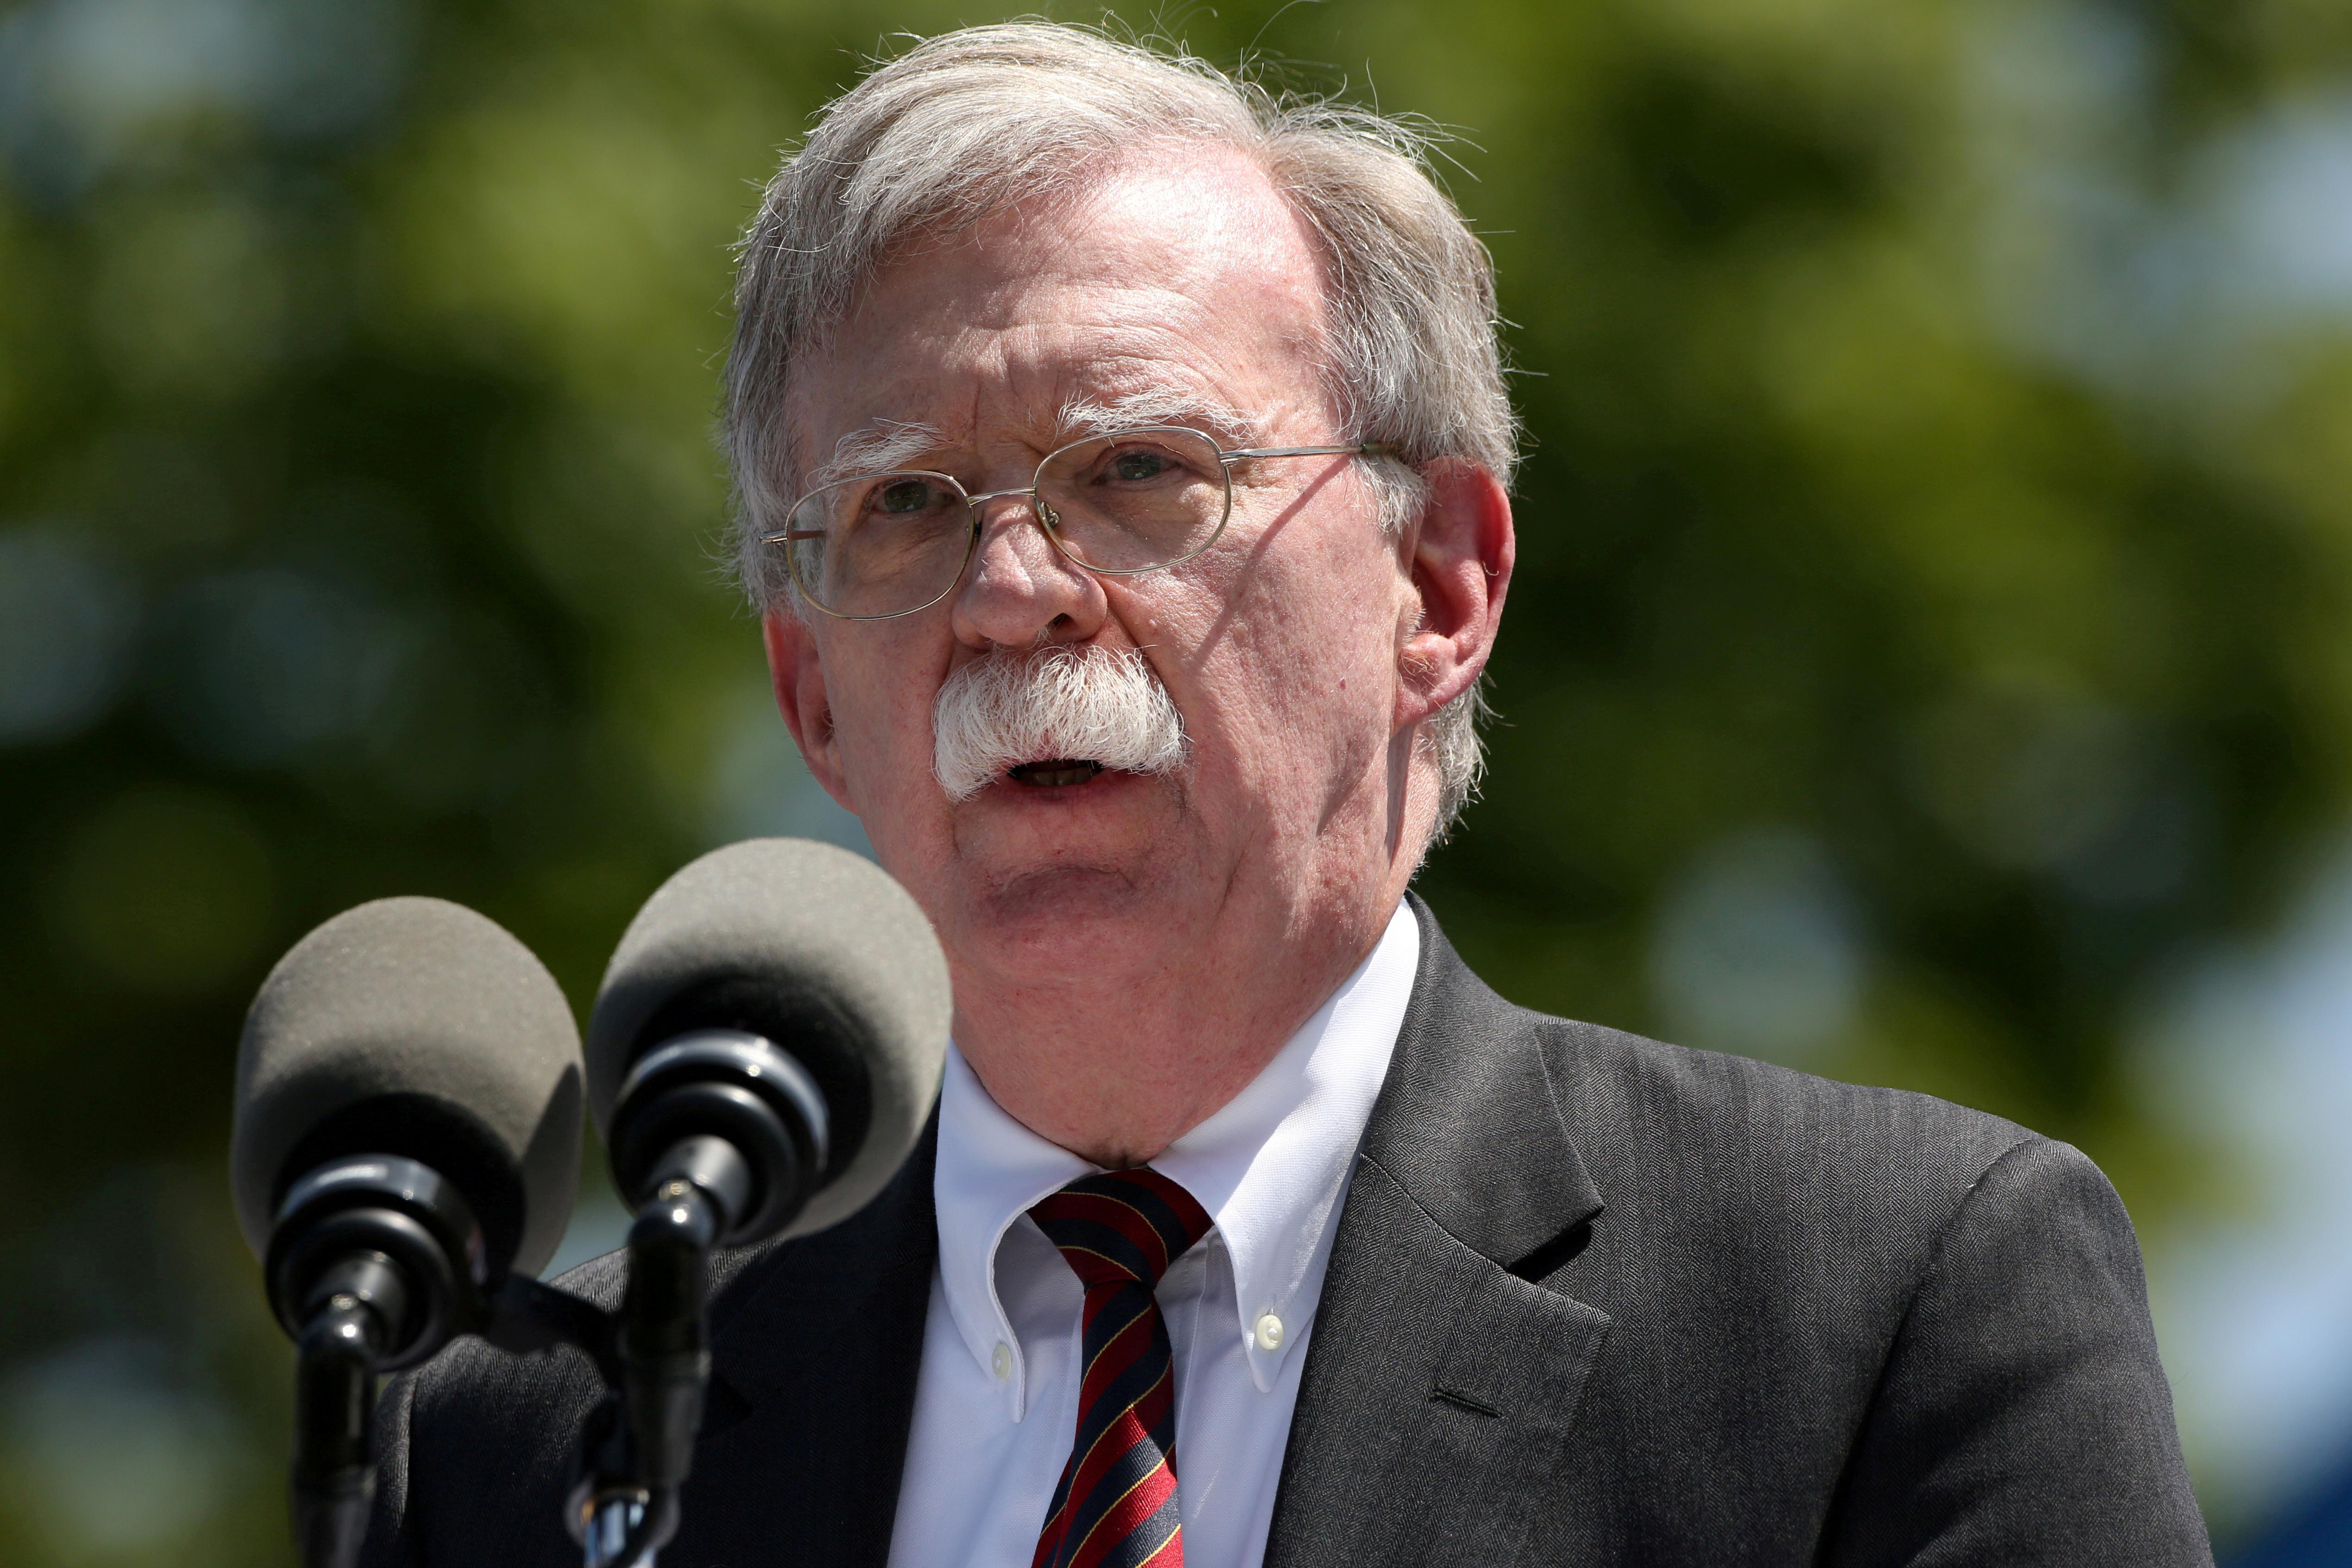 Trump lists familiar White House faces as possible Bolton successors